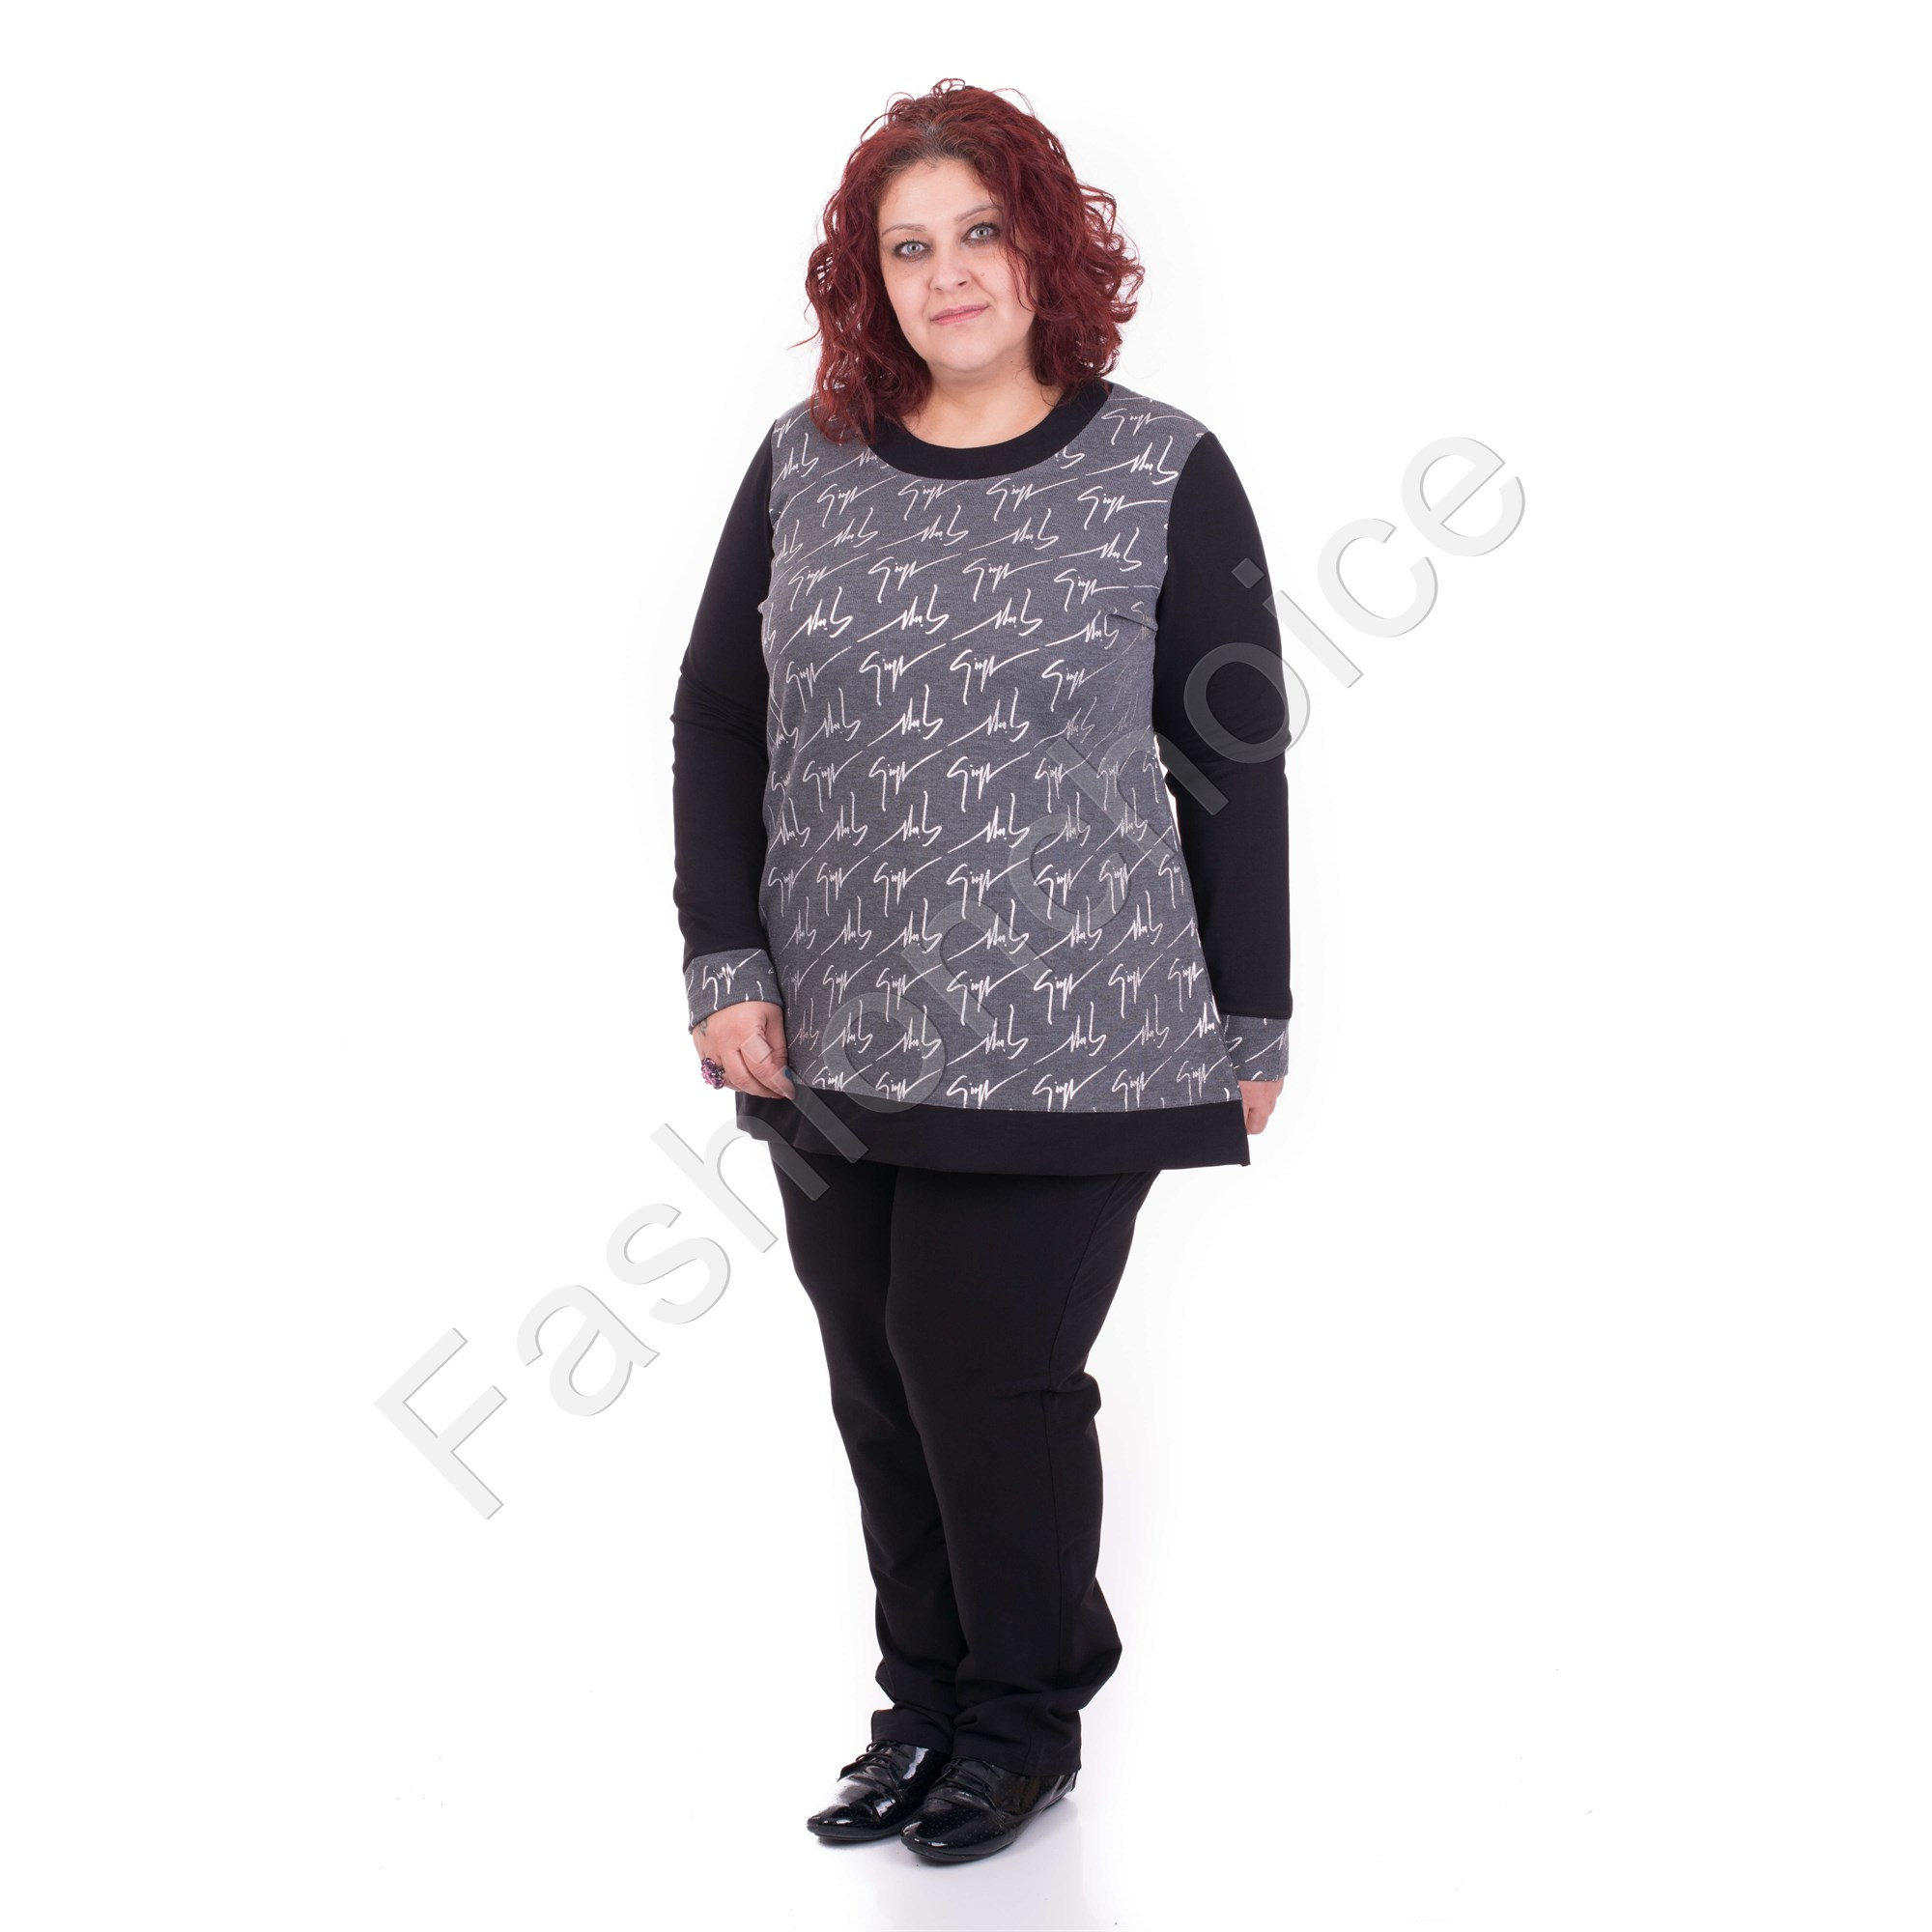 a5e43593596 Κομψό μάυρο γυναικείο maxi σετ Fashionchoice online shop